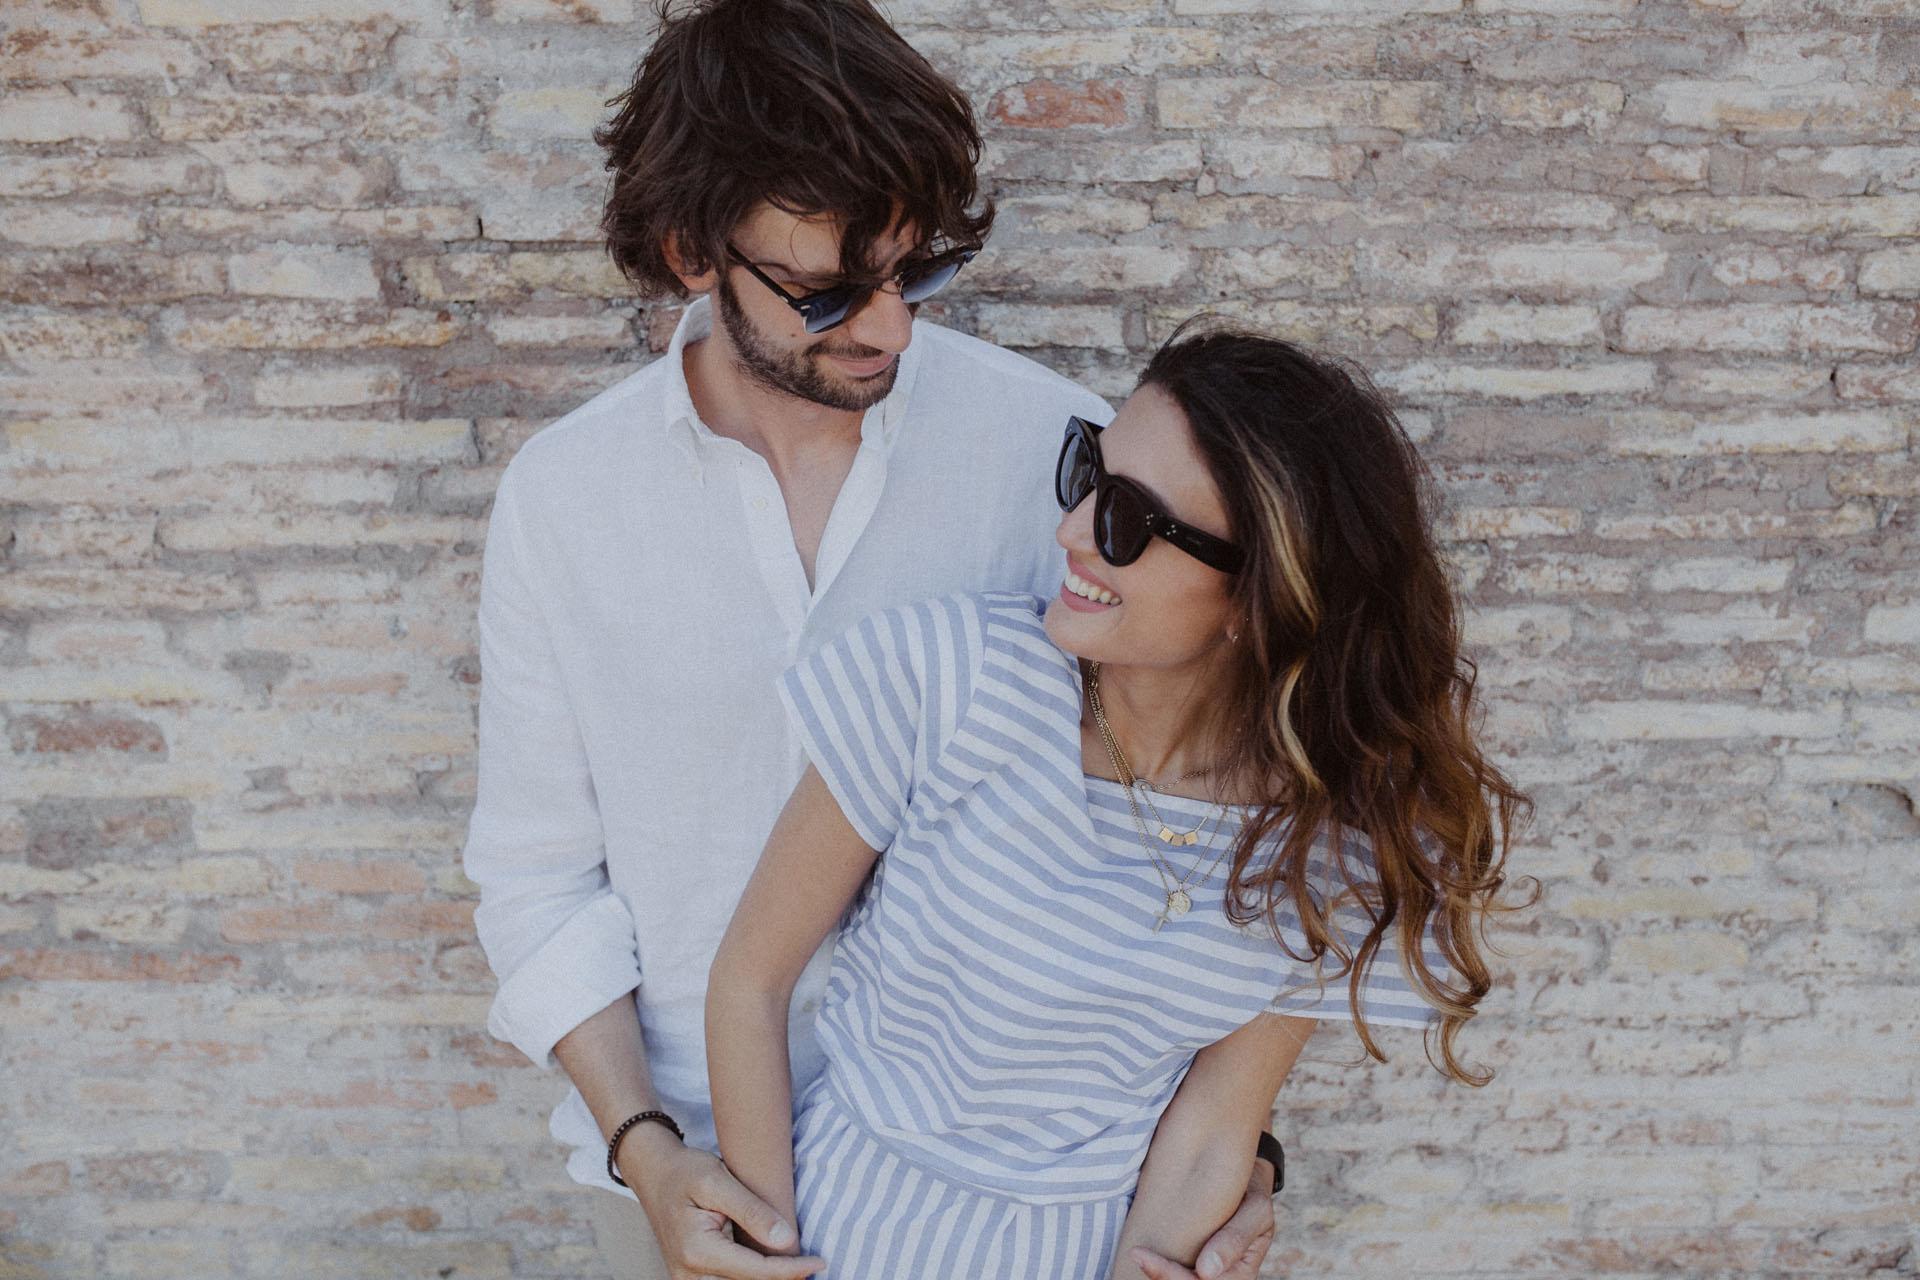 coupleshooting-roma-hochzeitsfotografen-wien-agnesundandi-33